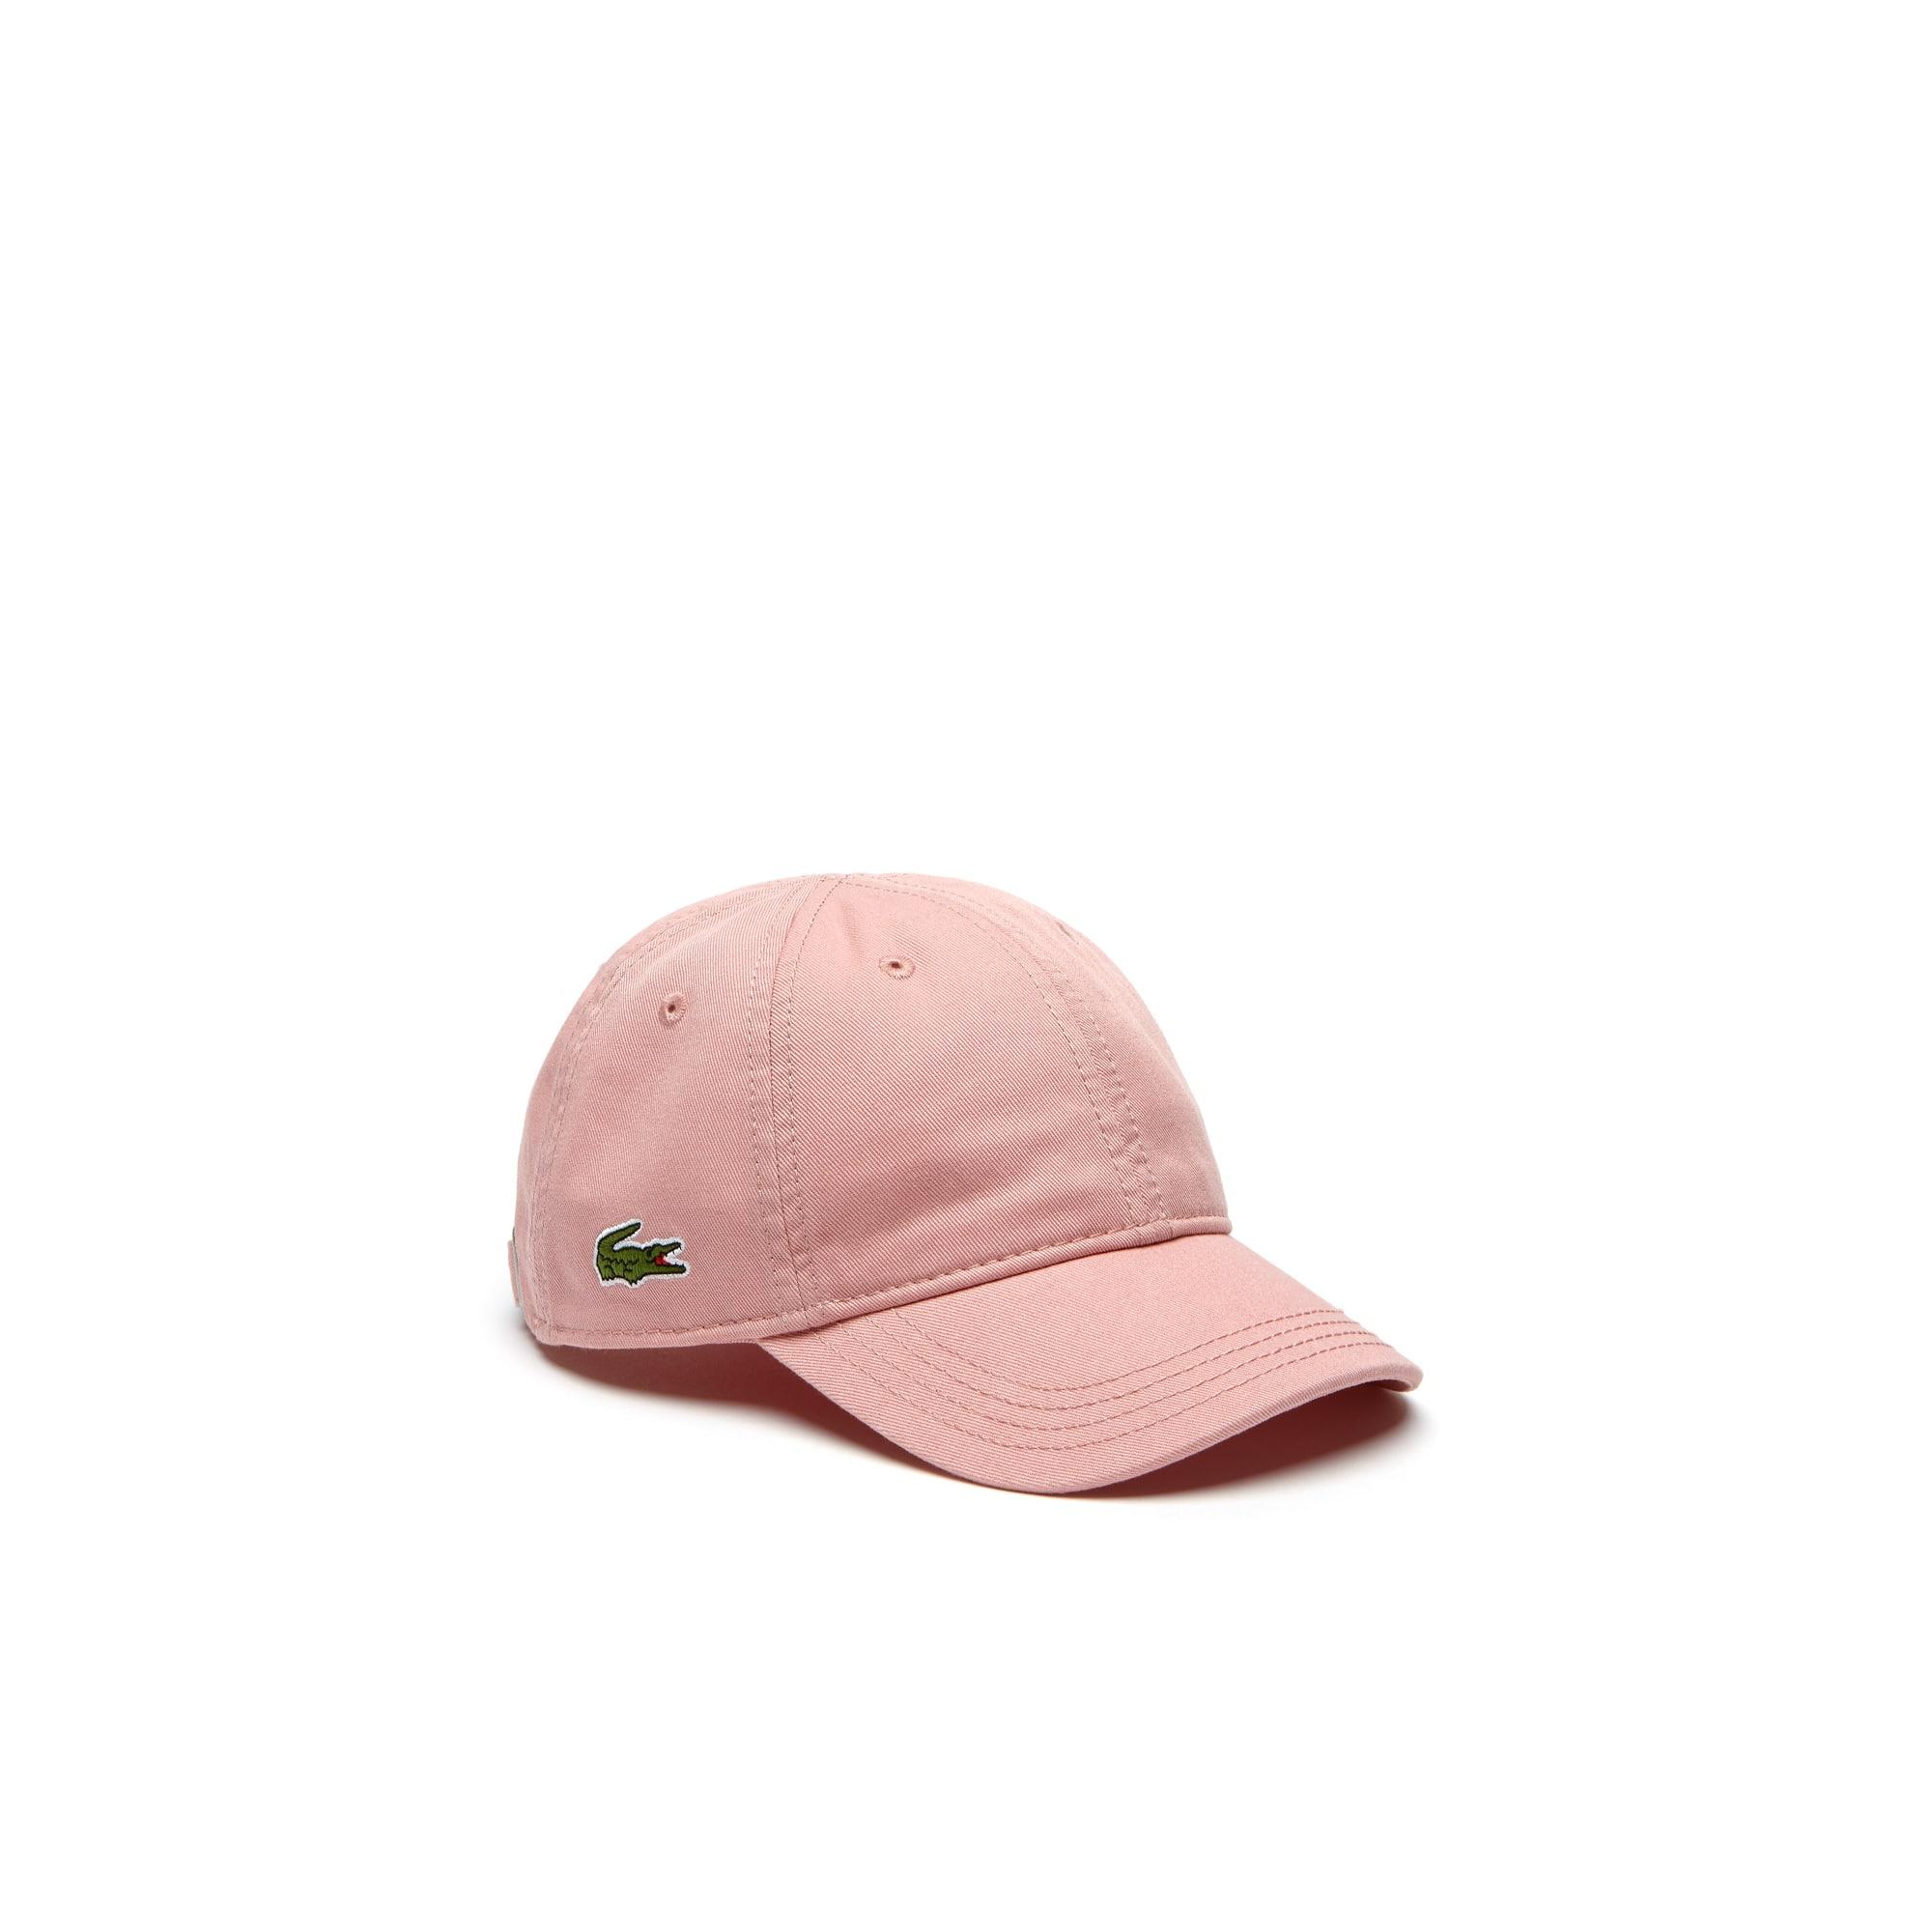 Mens' Solid gabardine cap